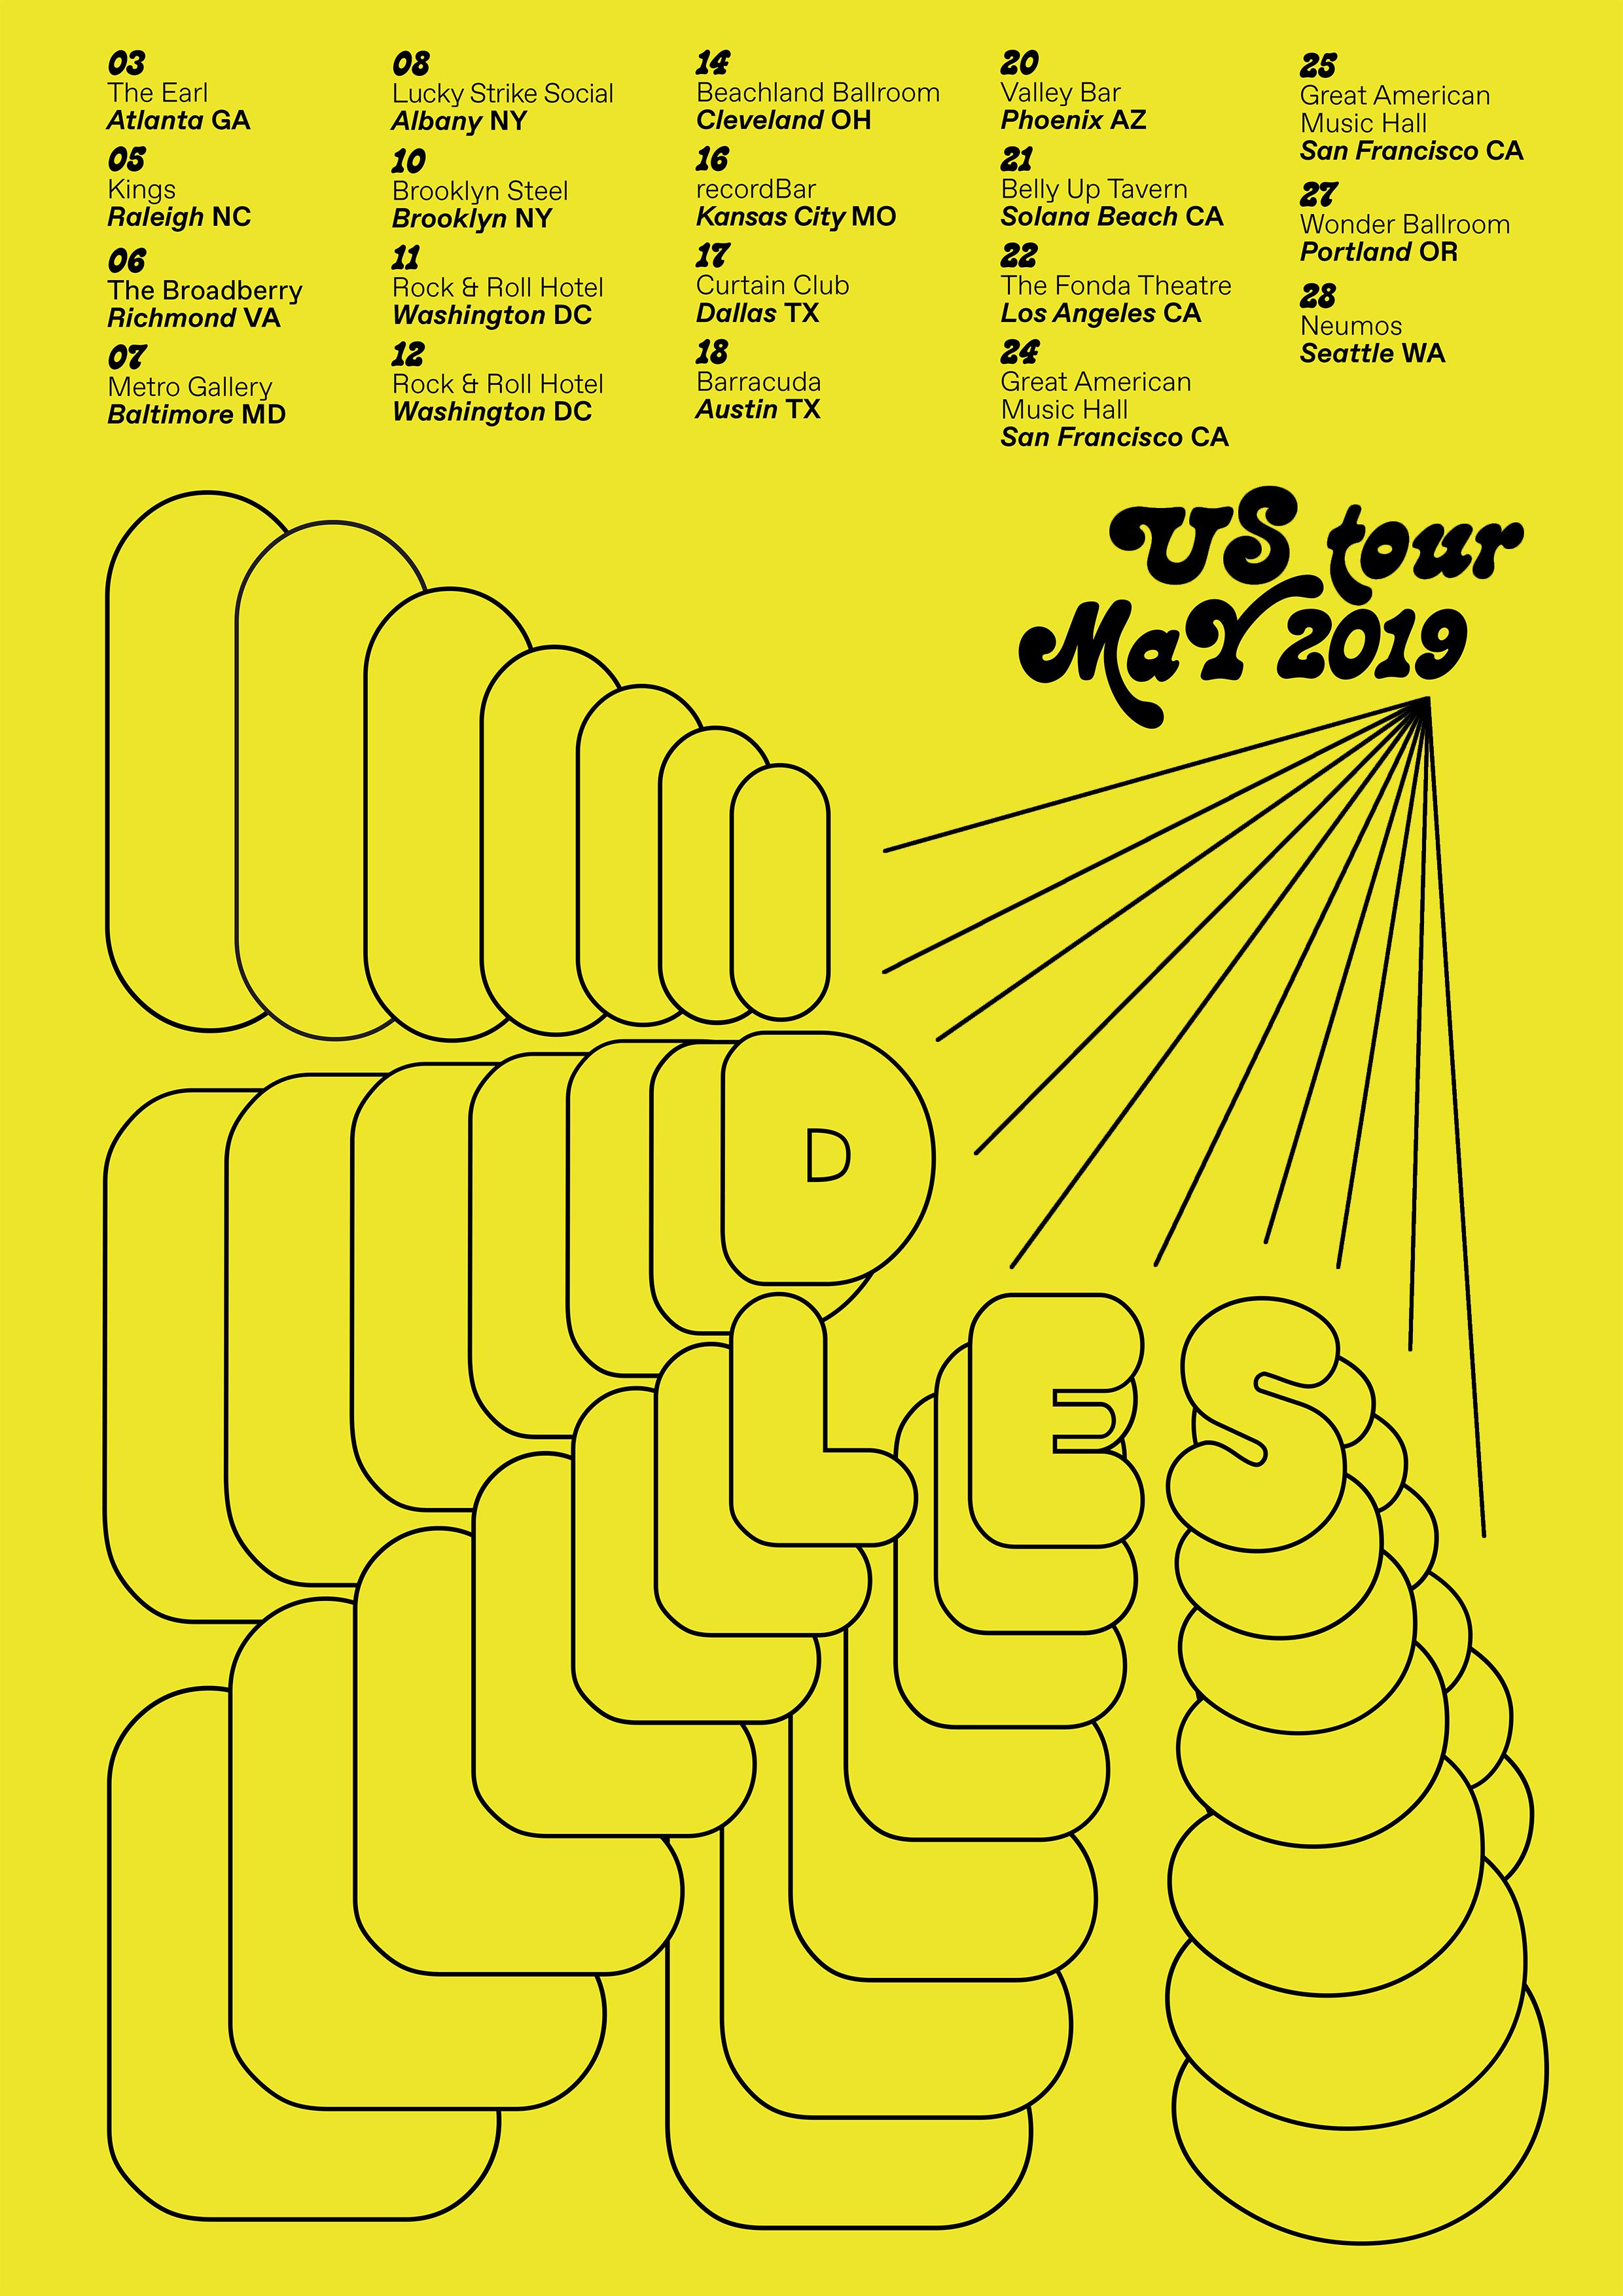 IDLES_US tour May19_A4 digital_YELLOW.jpg